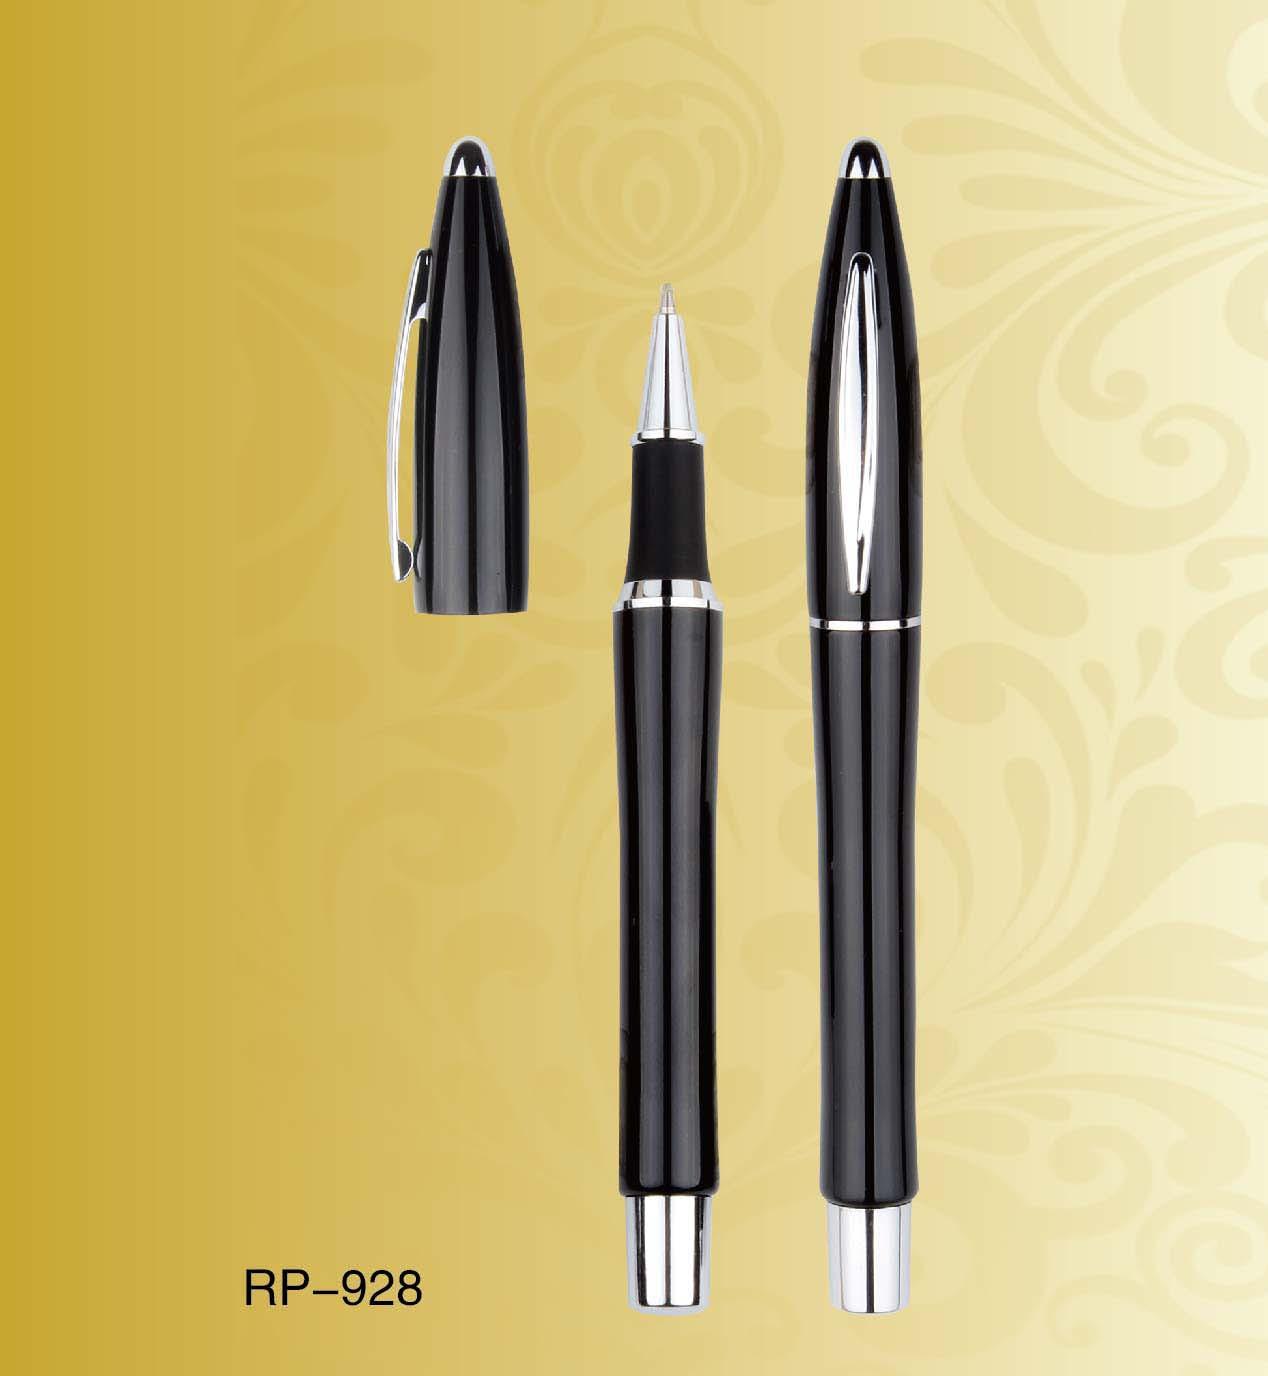 RP-928